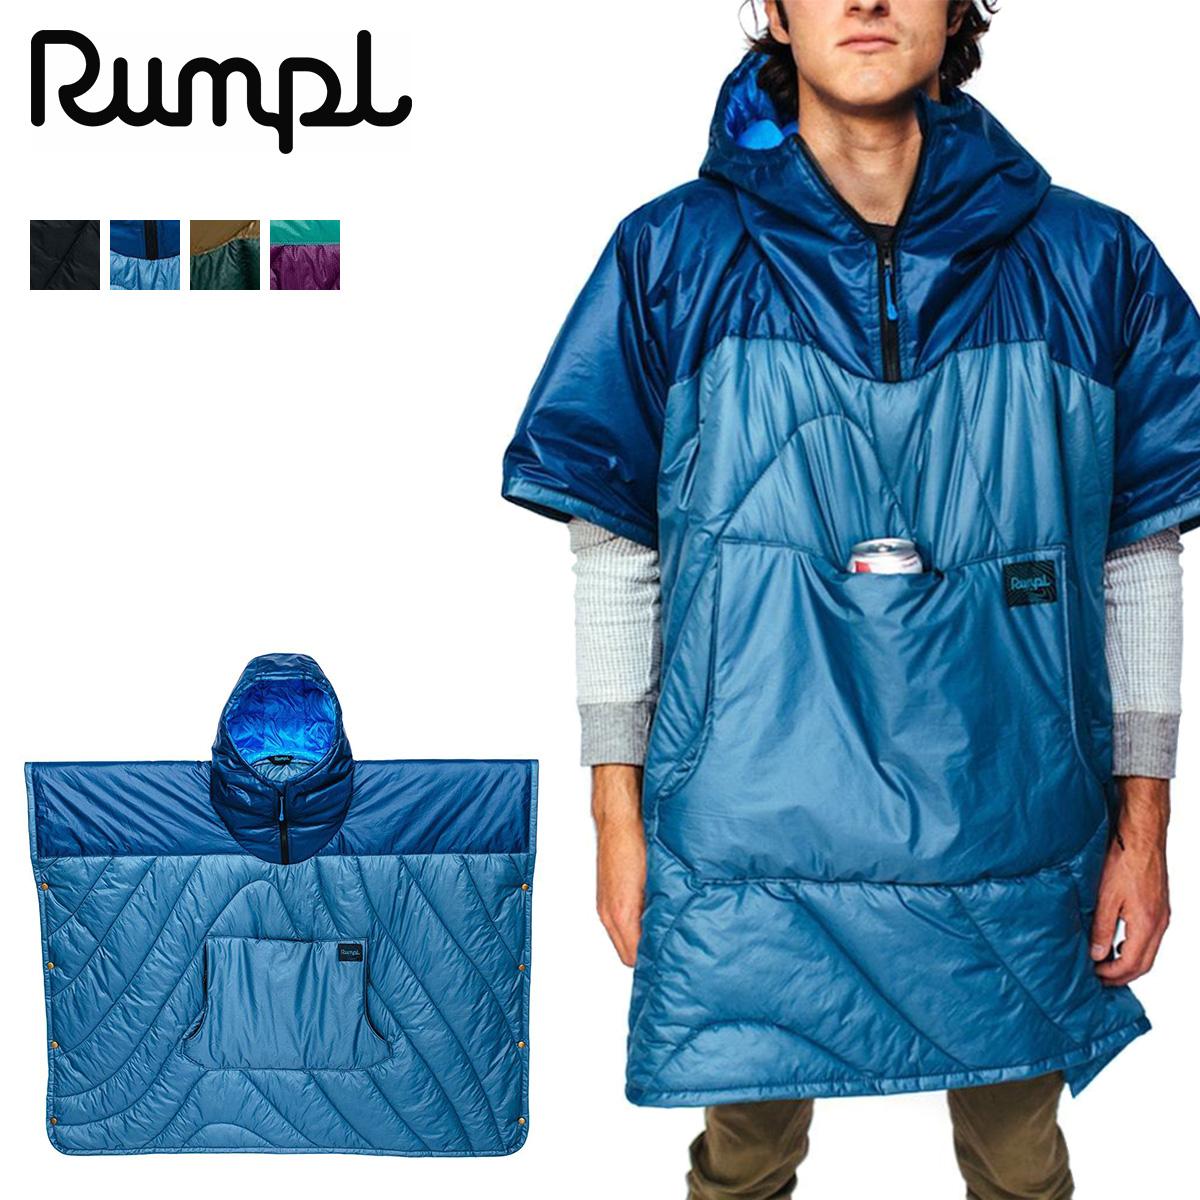 Rumpl PUFFY PONCHO ランプル ポンチョ コート マント メンズ レディース